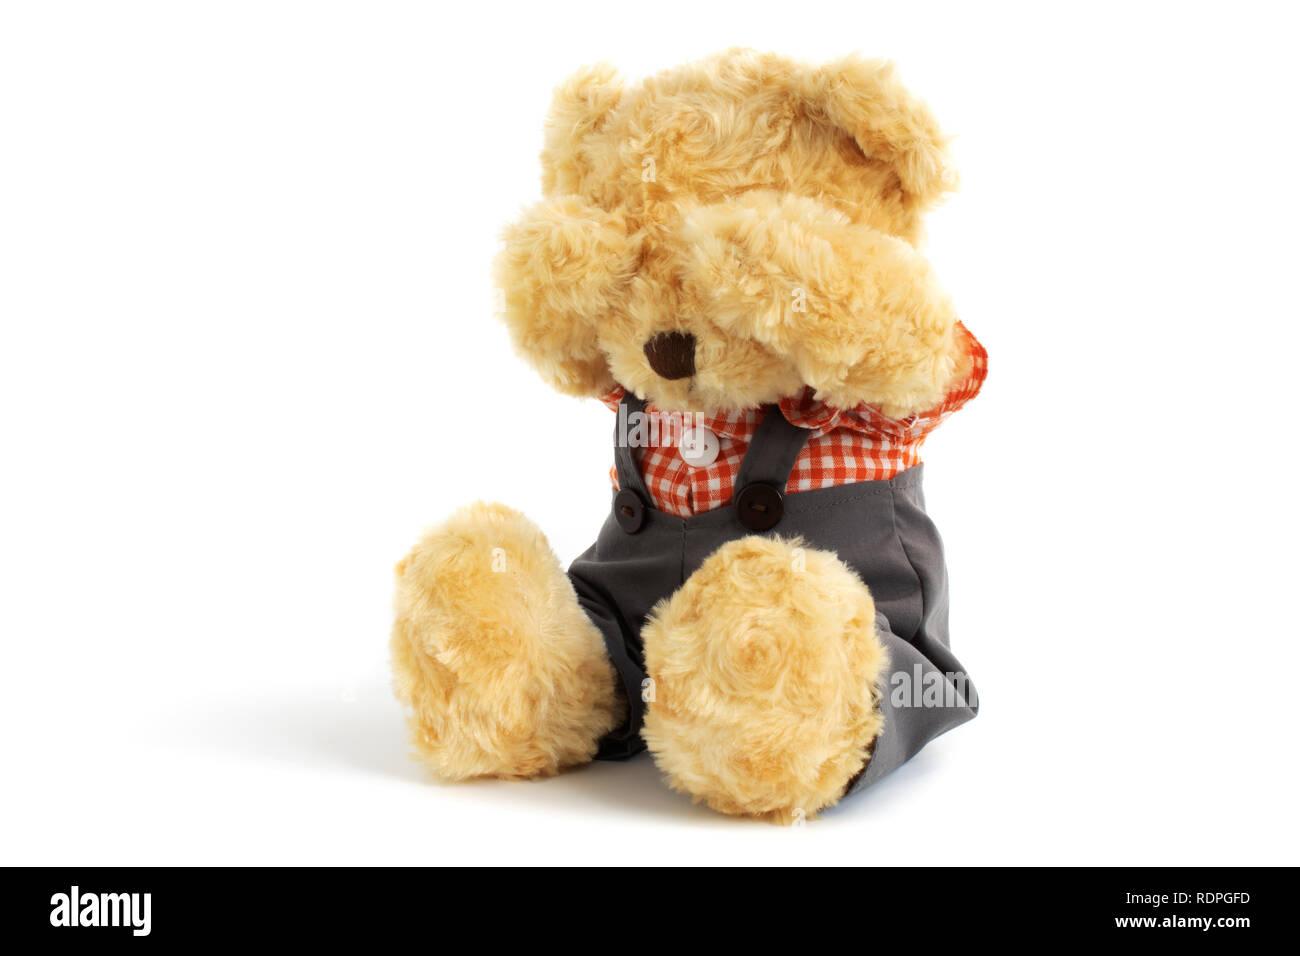 Crying Teddy Bear Imágenes De Stock Crying Teddy Bear Fotos De